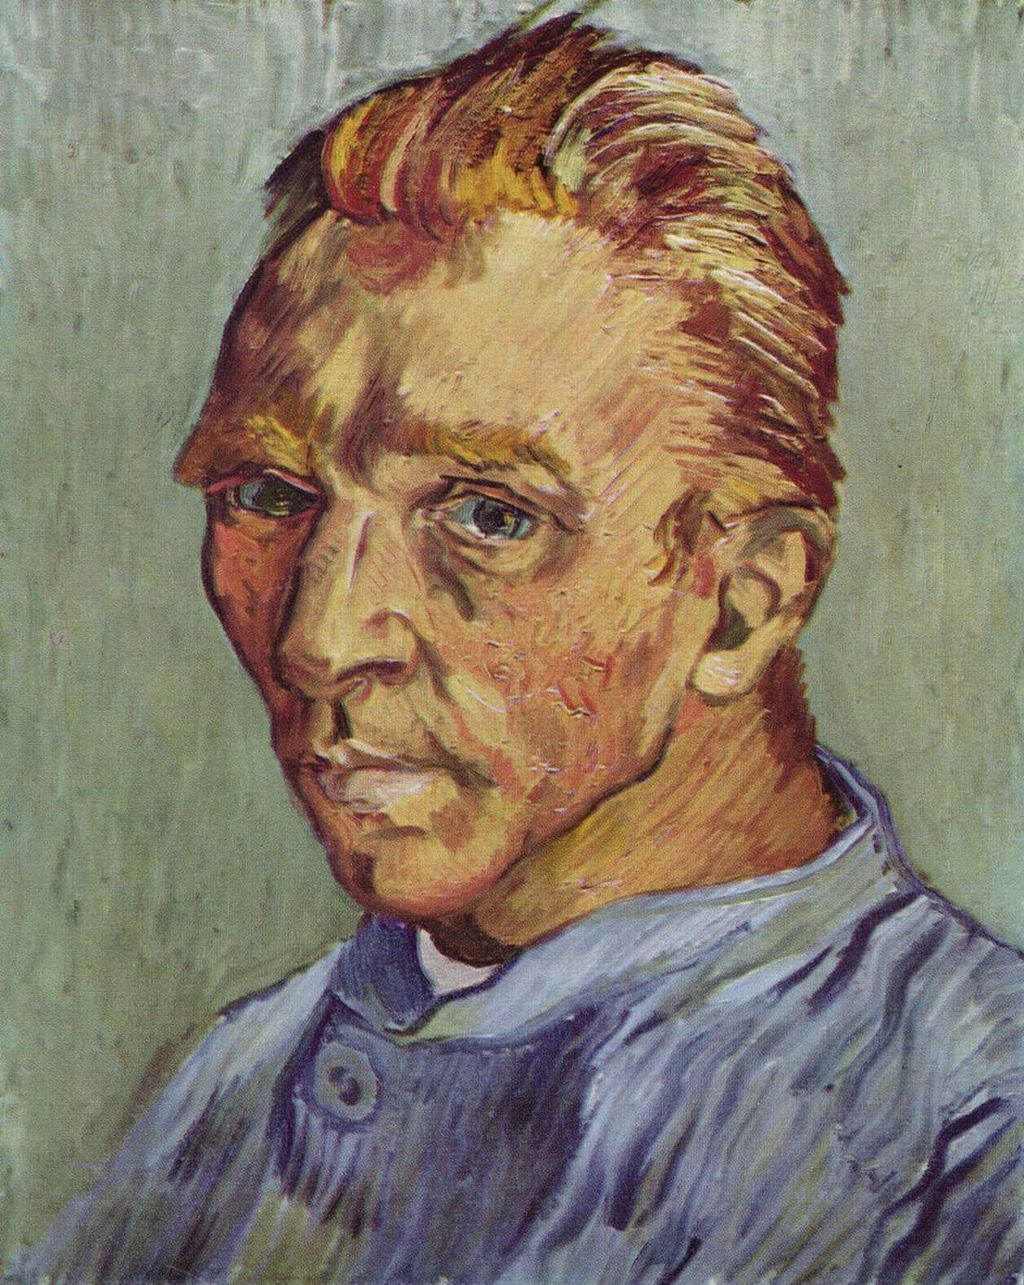 Van Goghs likely last self portrait